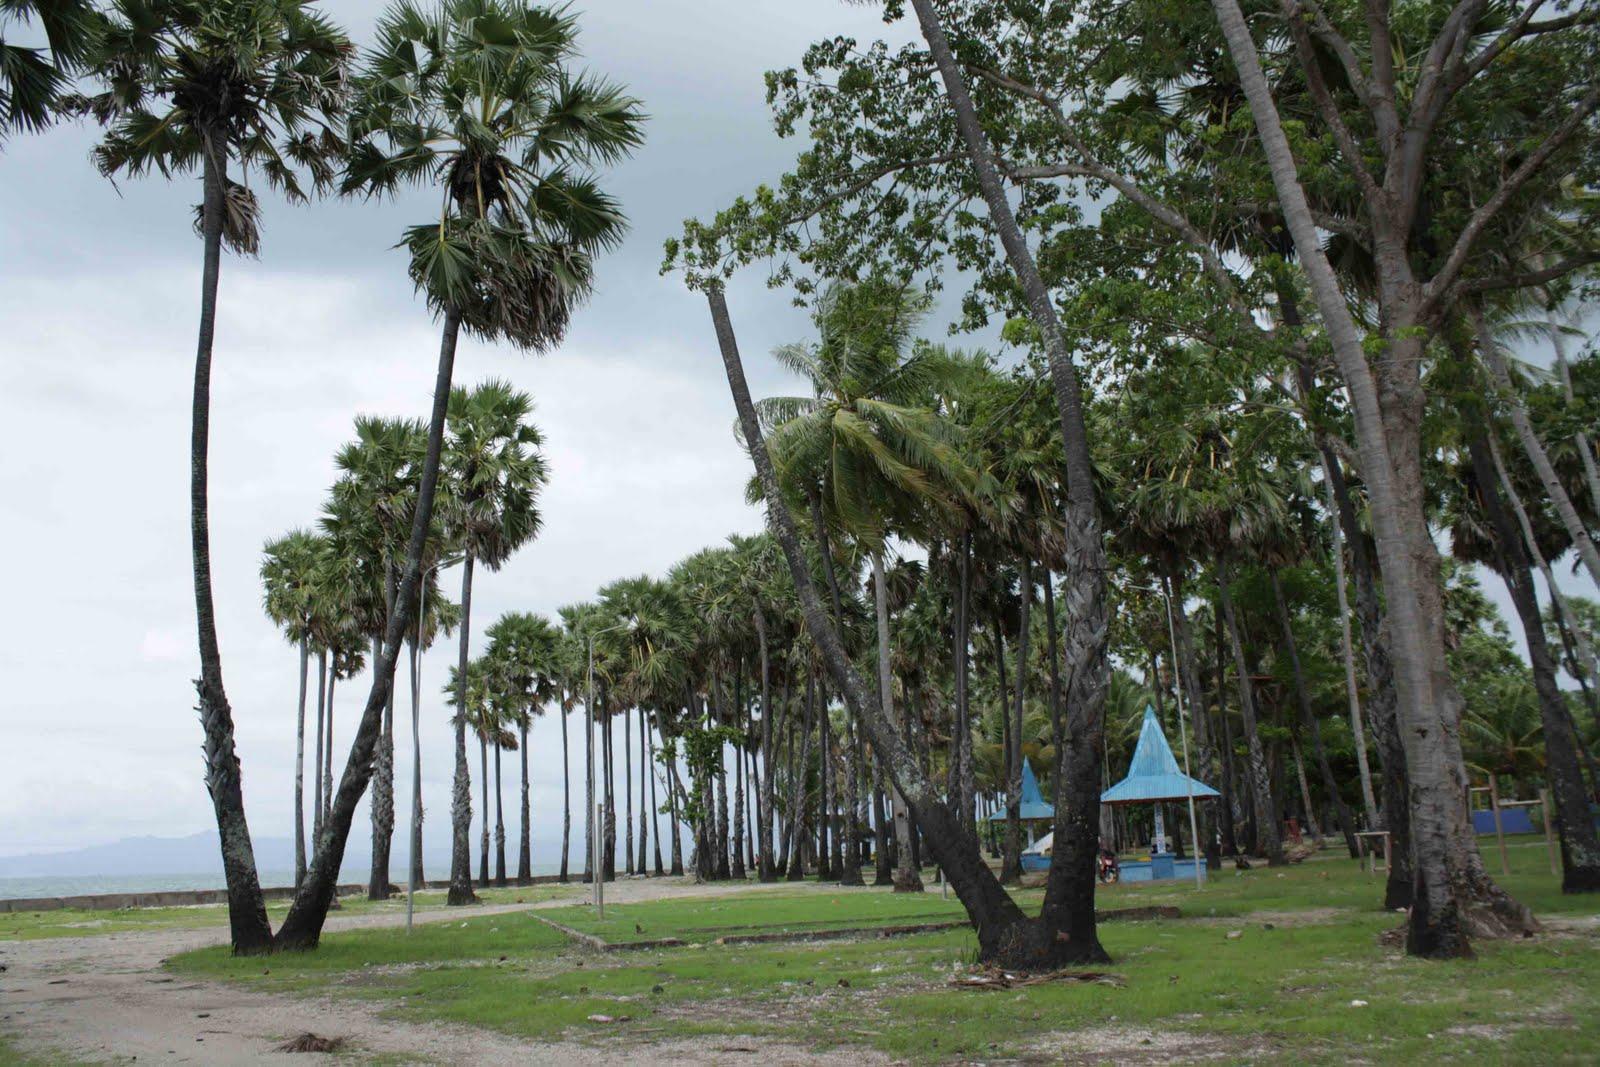 Kupang Amazing Tourism Place Mengunjungi Pulau Rote Pantai Lasiana Obyek